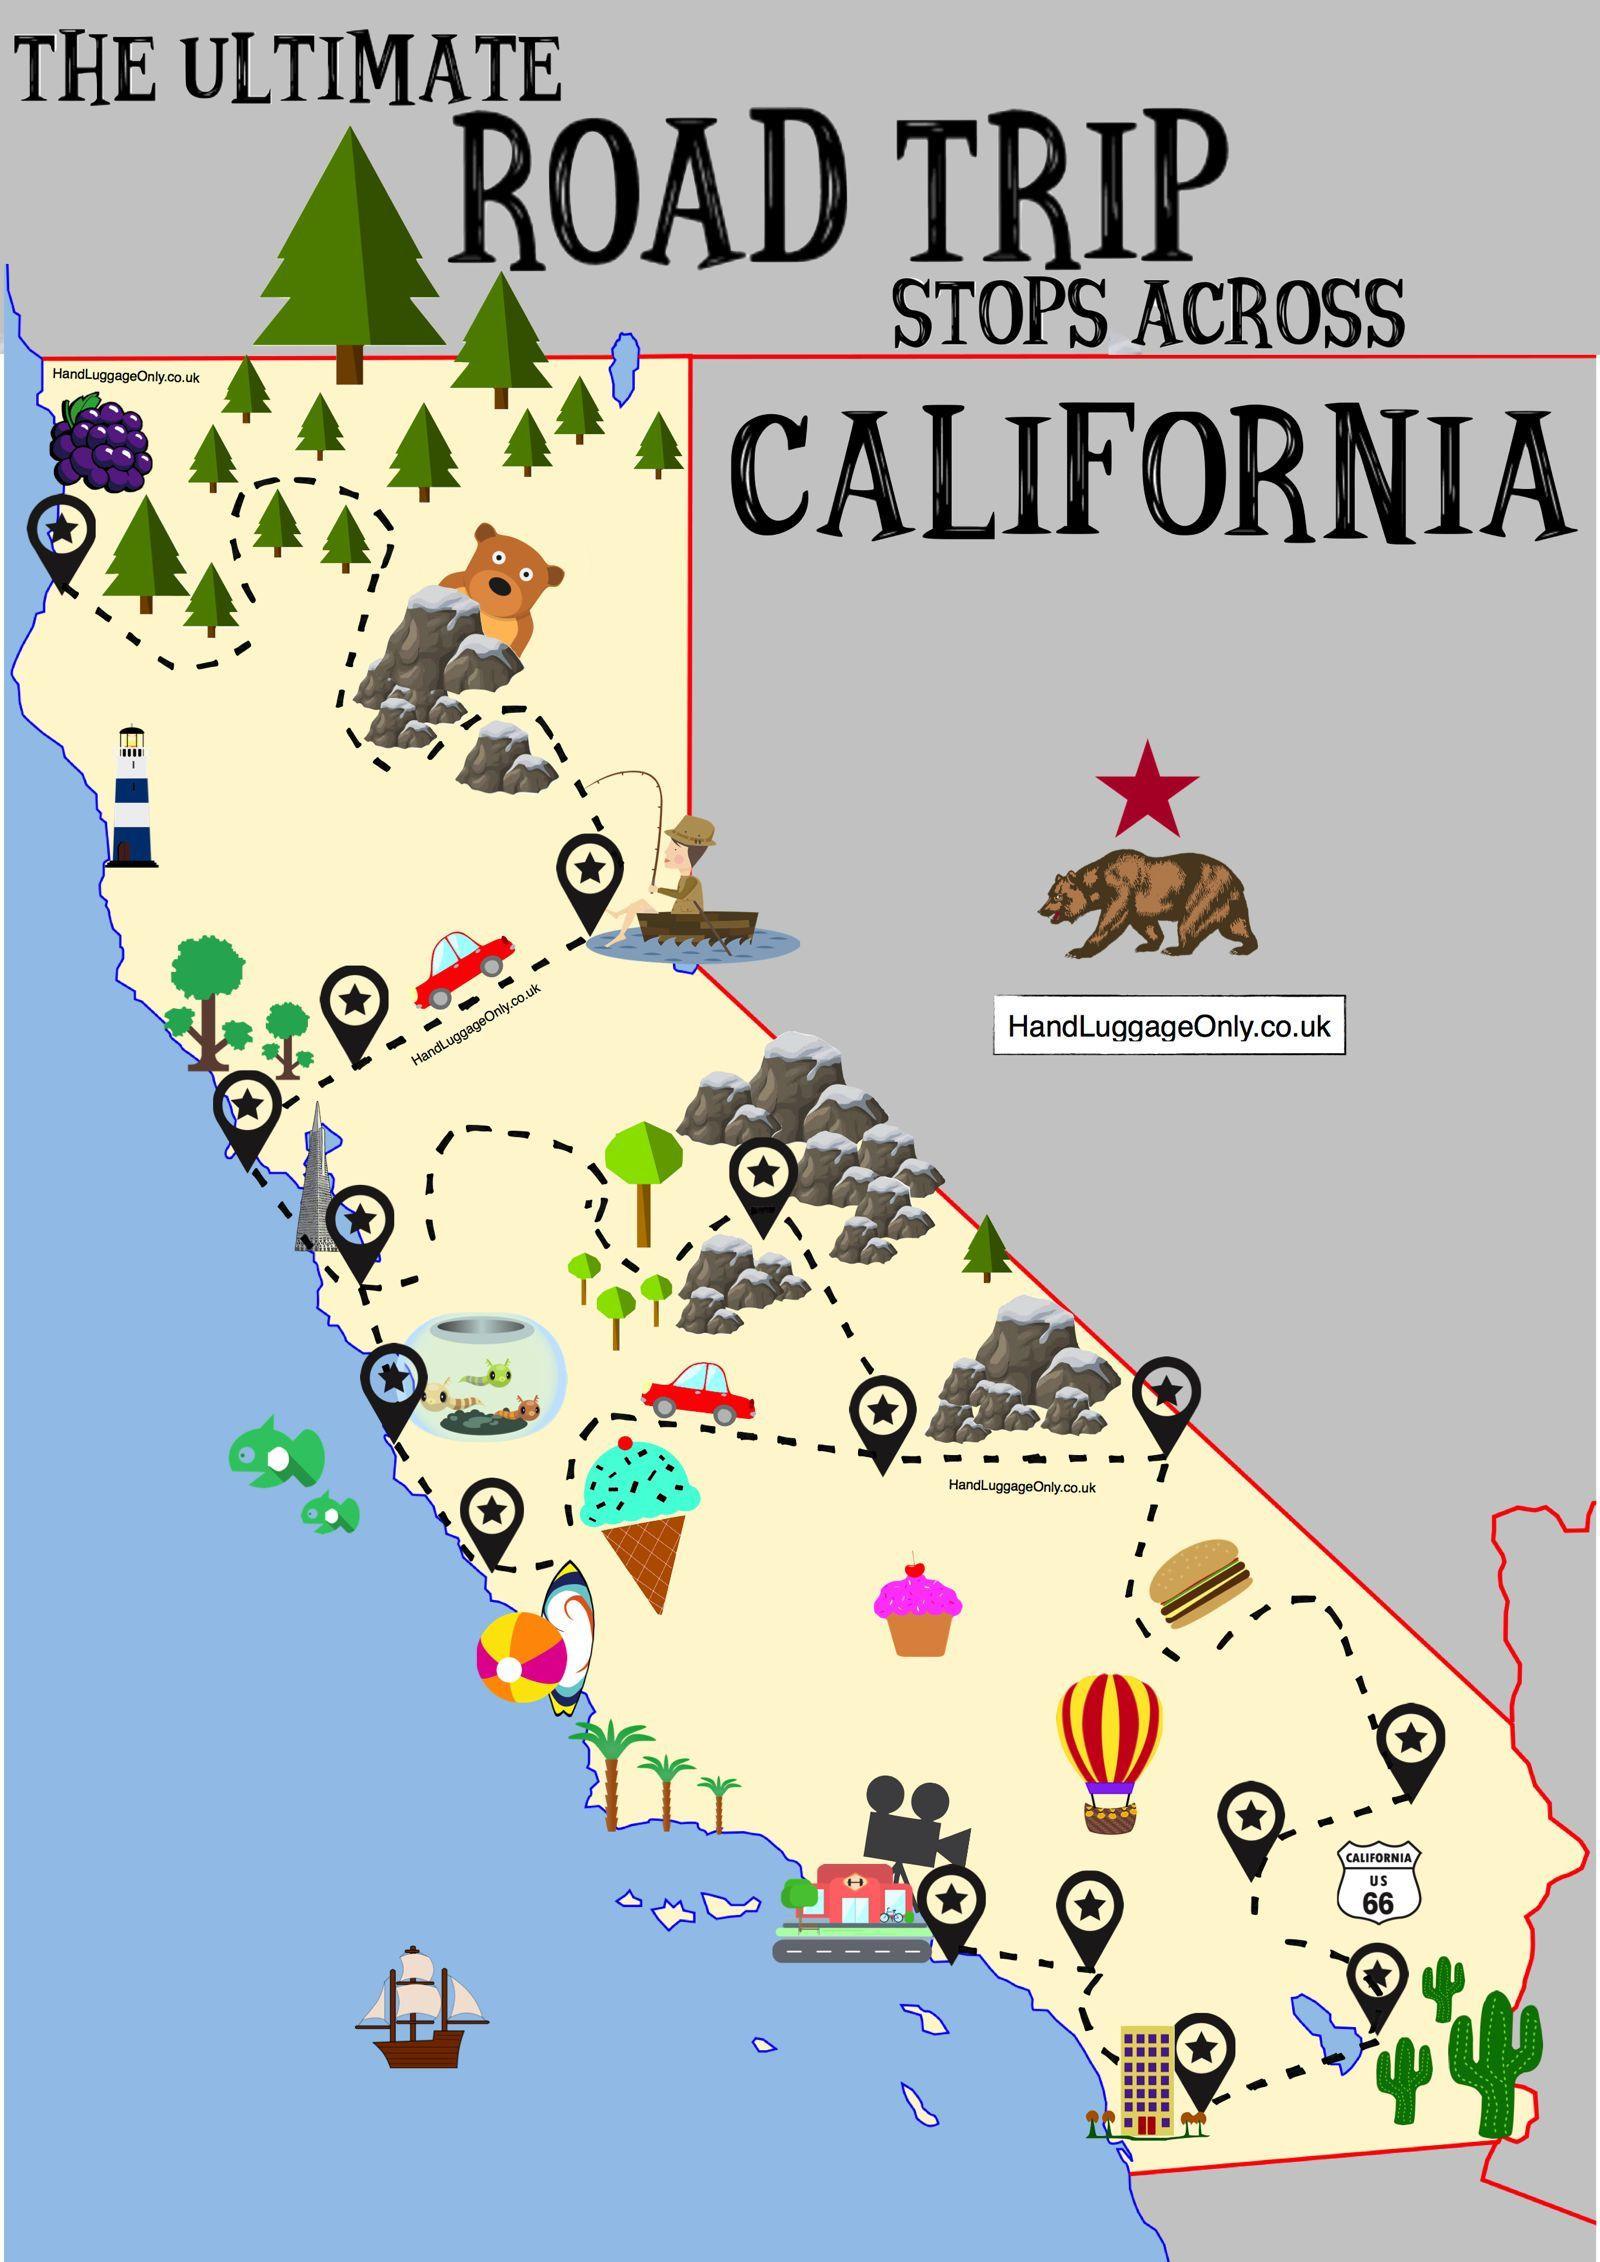 Santa Barbara On California Map Printable The Ultimate Road Trip Map - Santa Barbara California Map